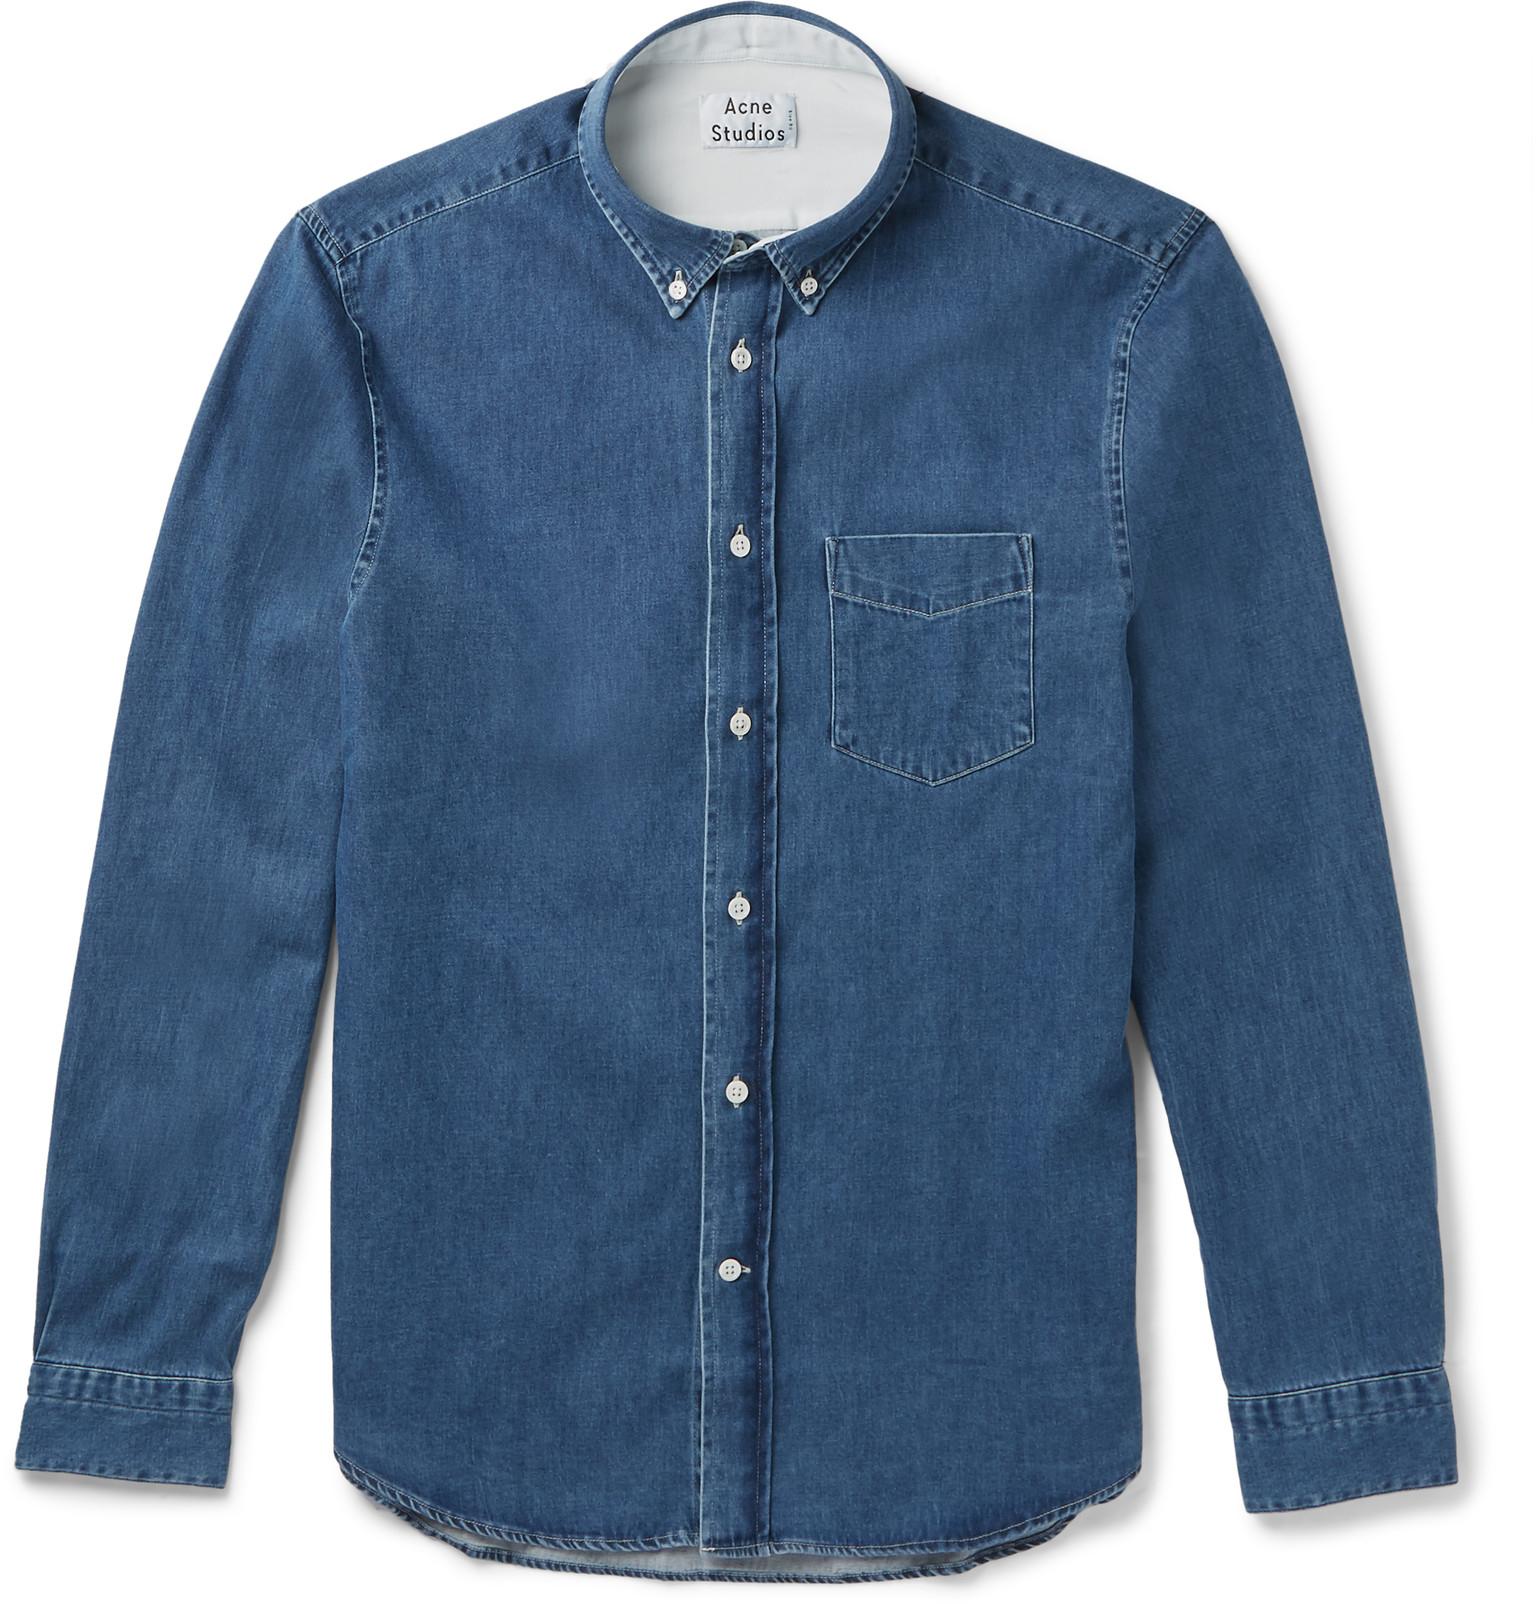 743da6d56d Acne Studios Isherwood Slim-fit Button-down Collar Washed-denim ...